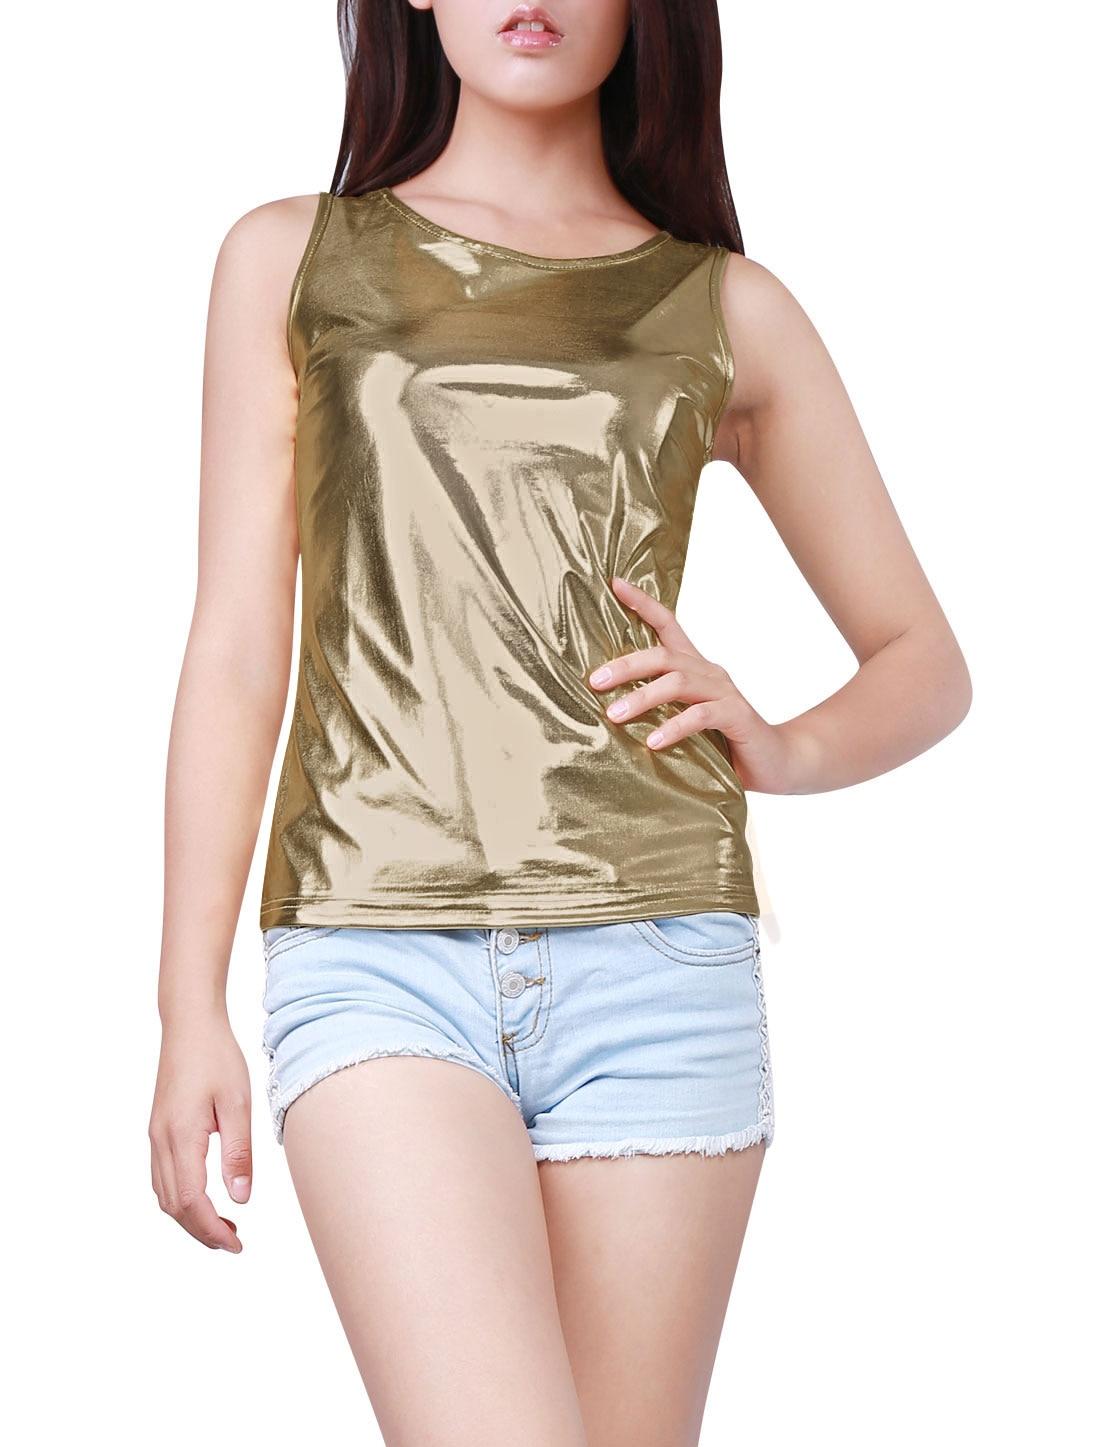 a04538e74ba8d4 Allegra K Woman U Neck Stretchy Slim Fit Metallic Tank Top-in T-Shirts from  Women s Clothing on Aliexpress.com